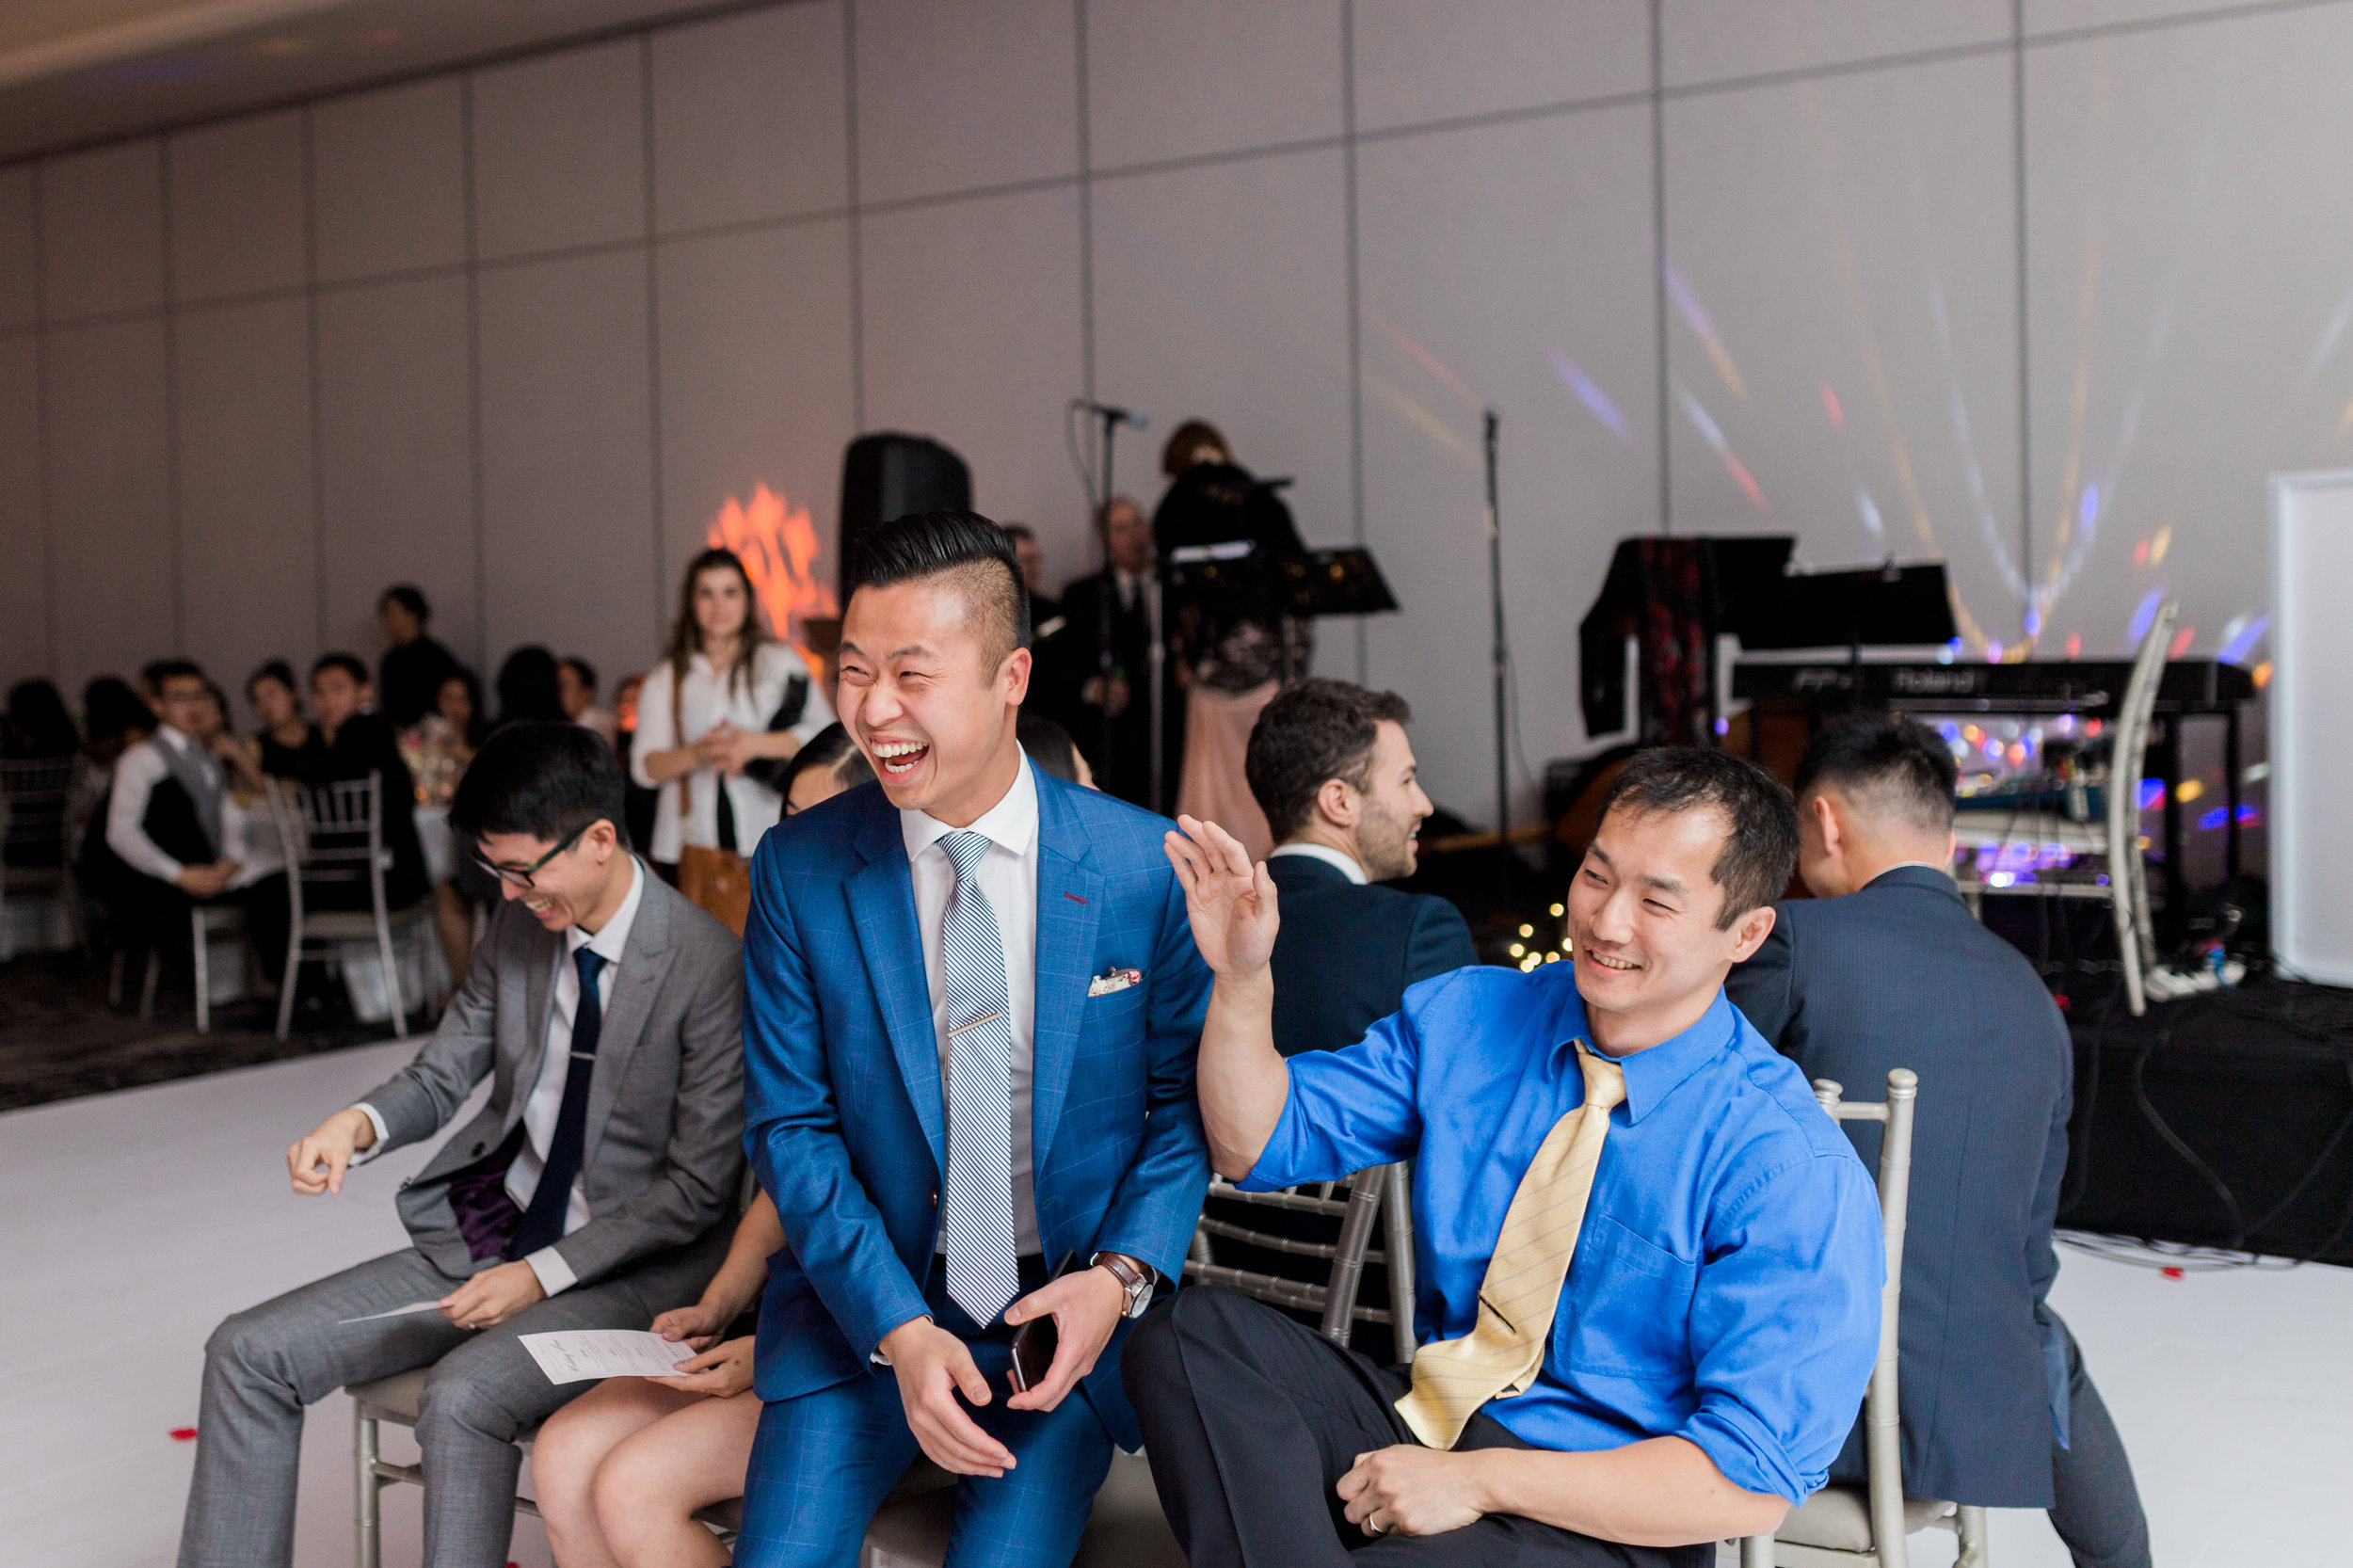 Parkview Manor Wedding - Reception-119.jpg